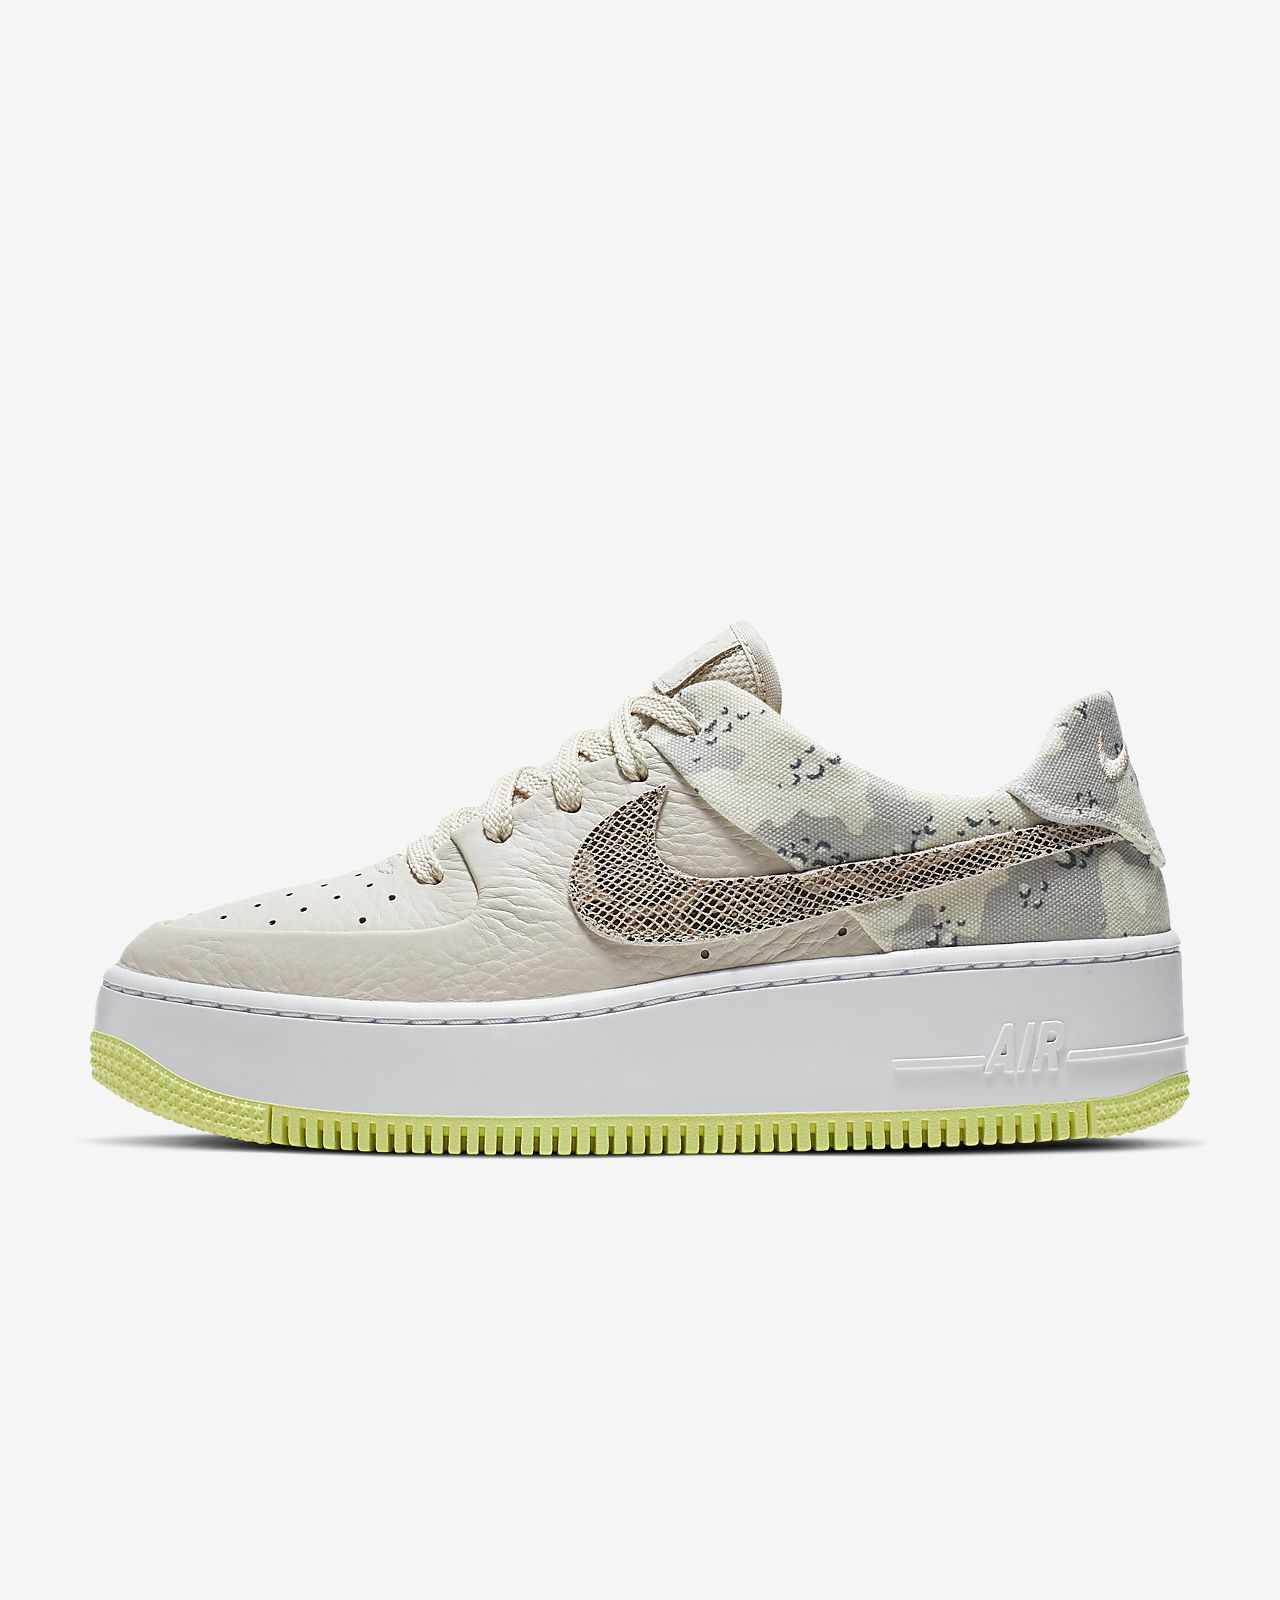 Sapatilhas Nike Air Force 1 Sage Low Premium Camo para mulher